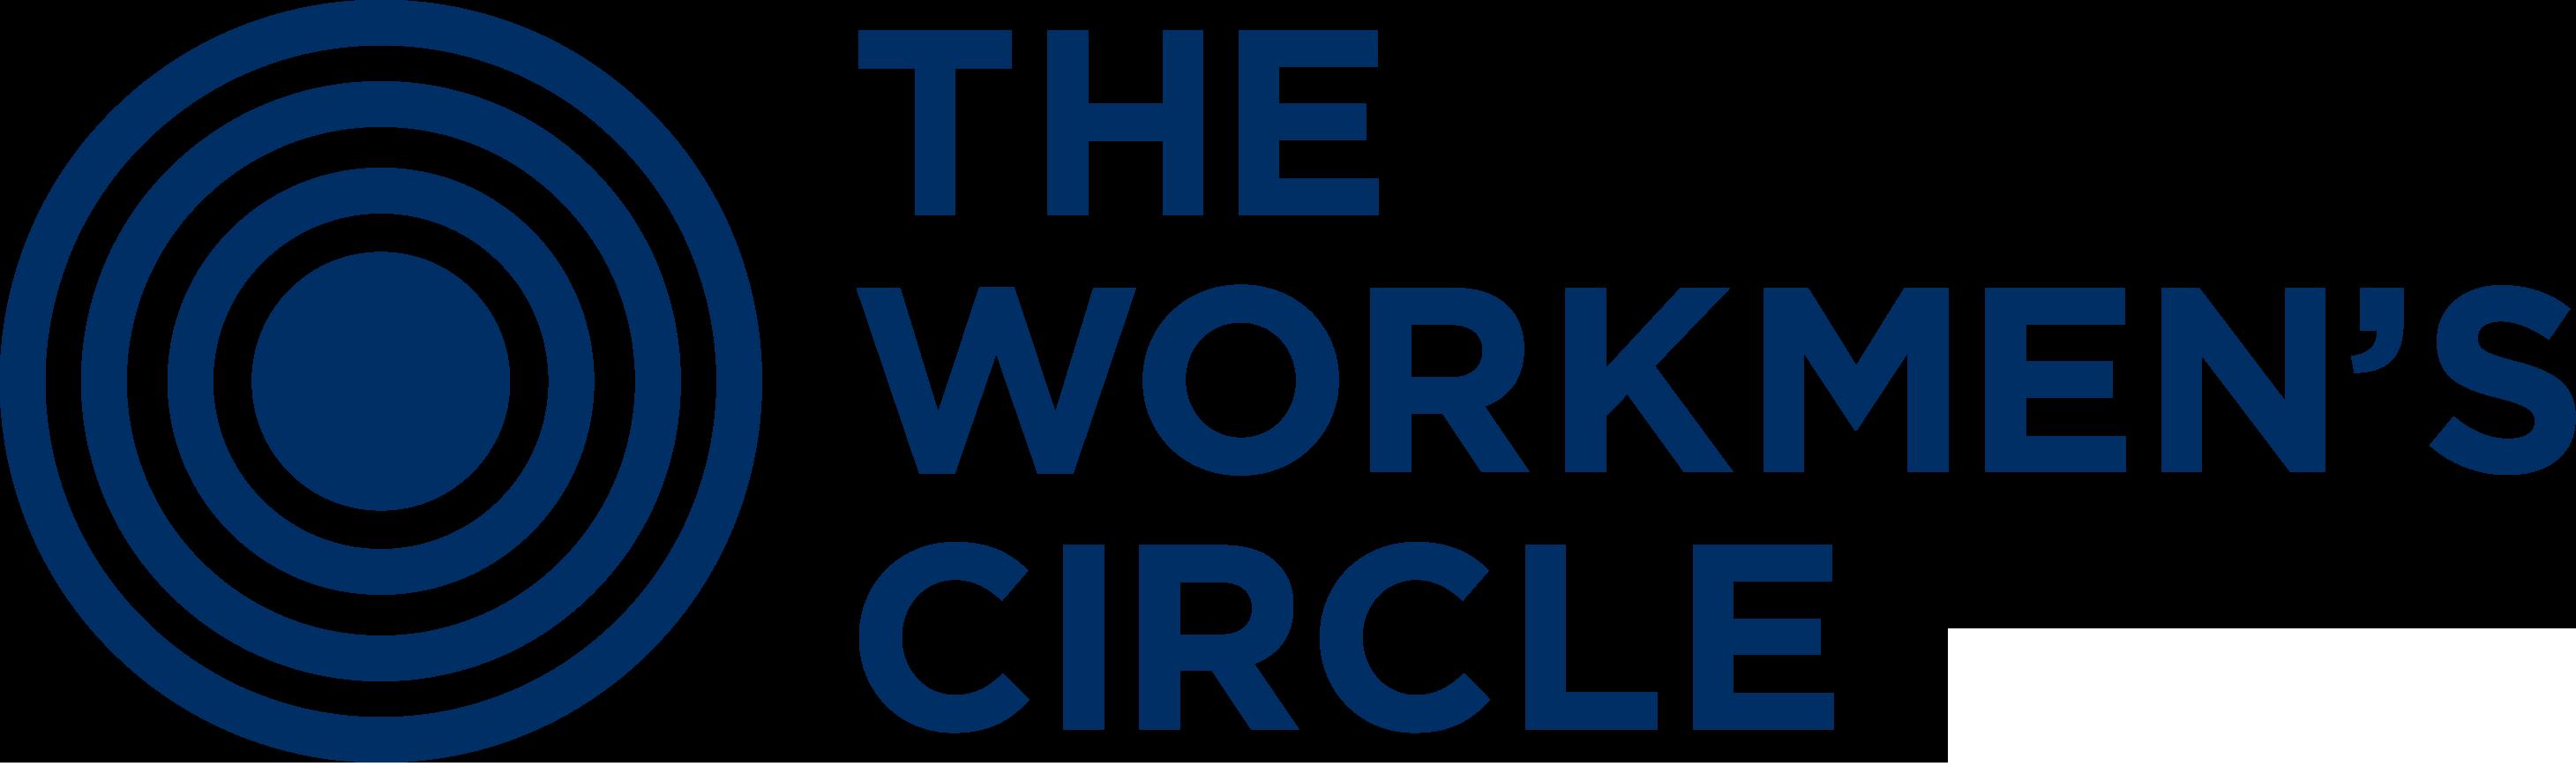 The Workmen's Circle